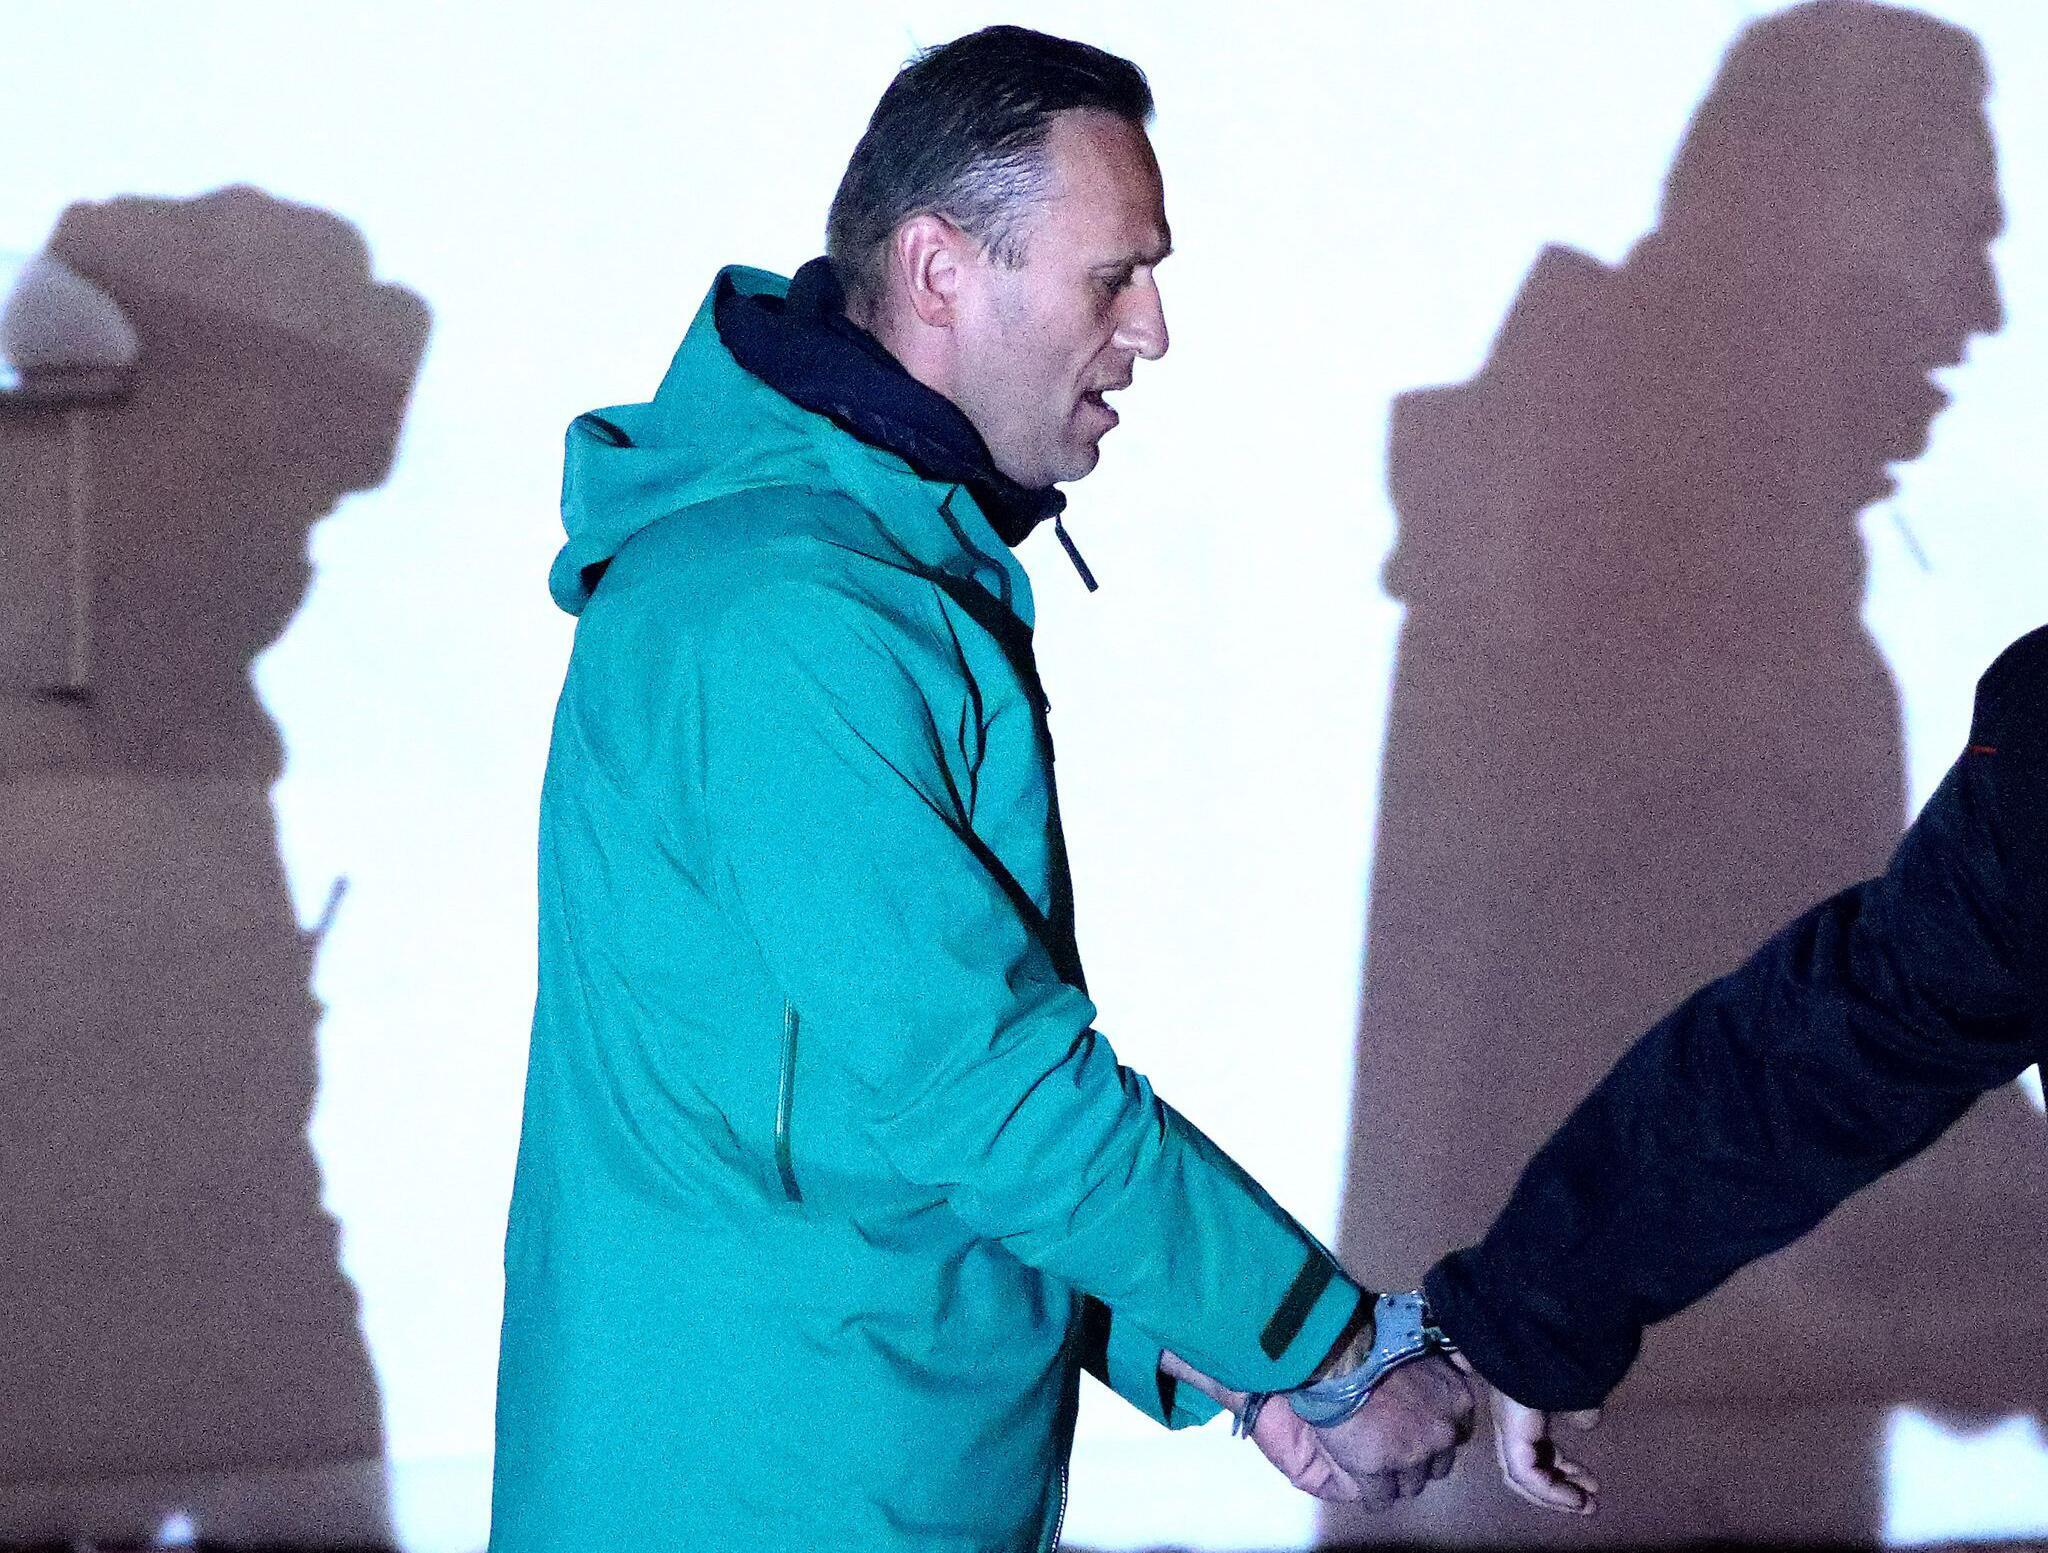 Bild zu Kremlkritiker Nawalny in Russland